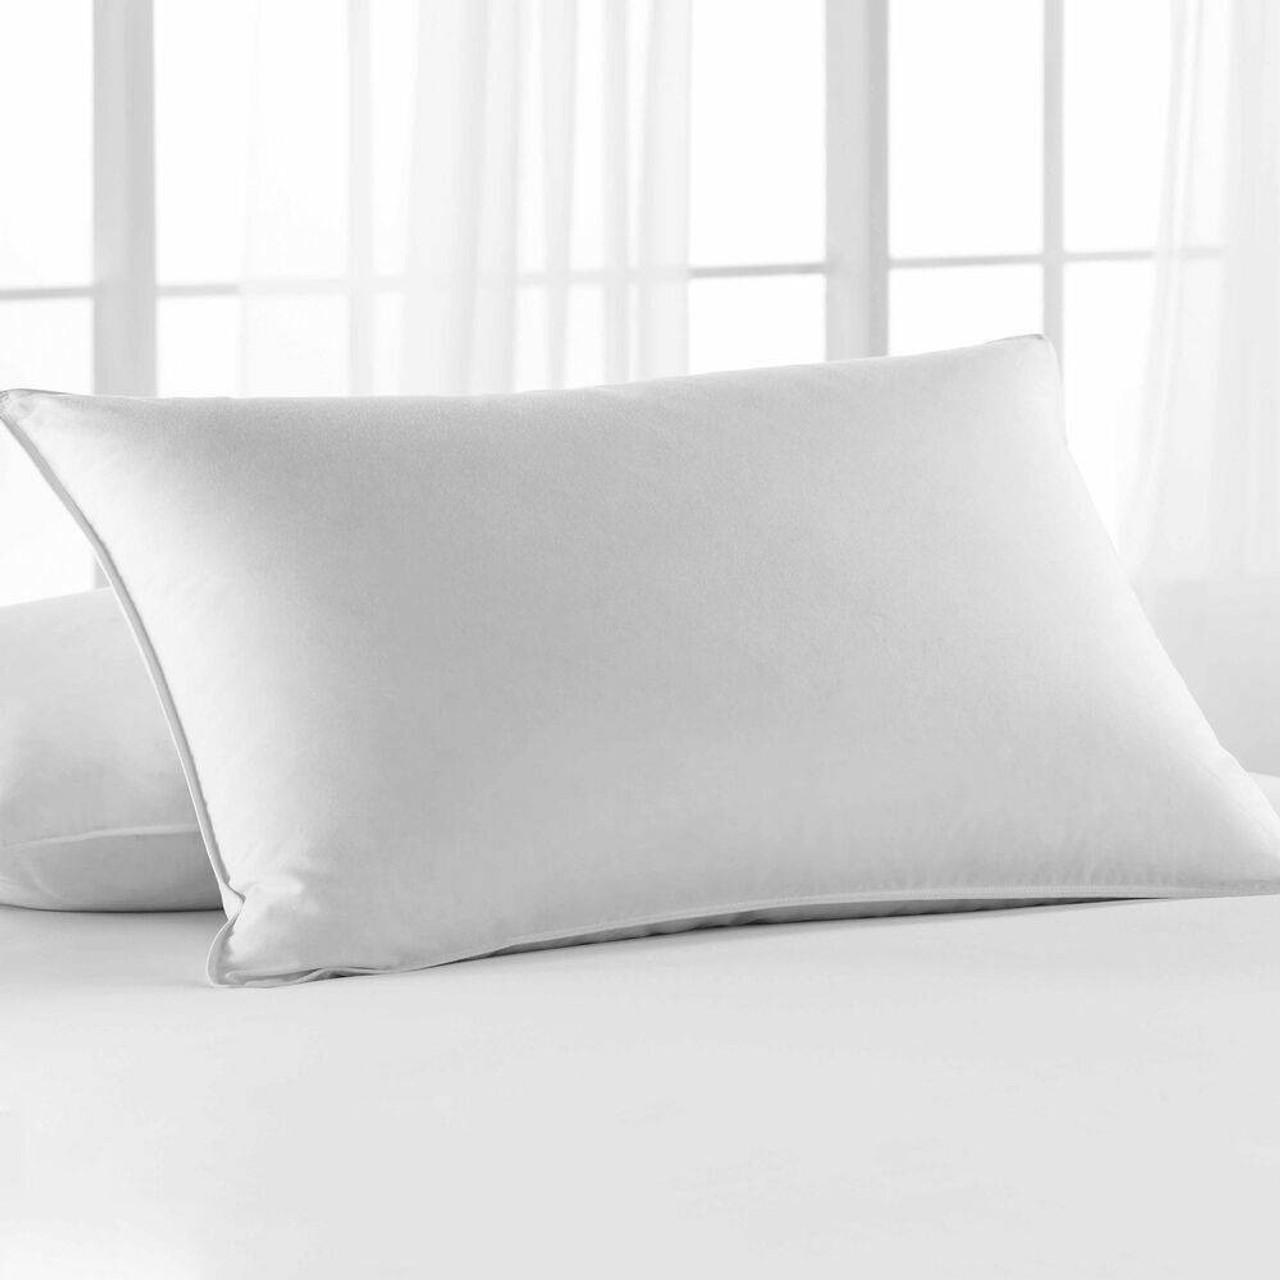 Restful Nights Restful Nights Pillows or Beyond Comfort